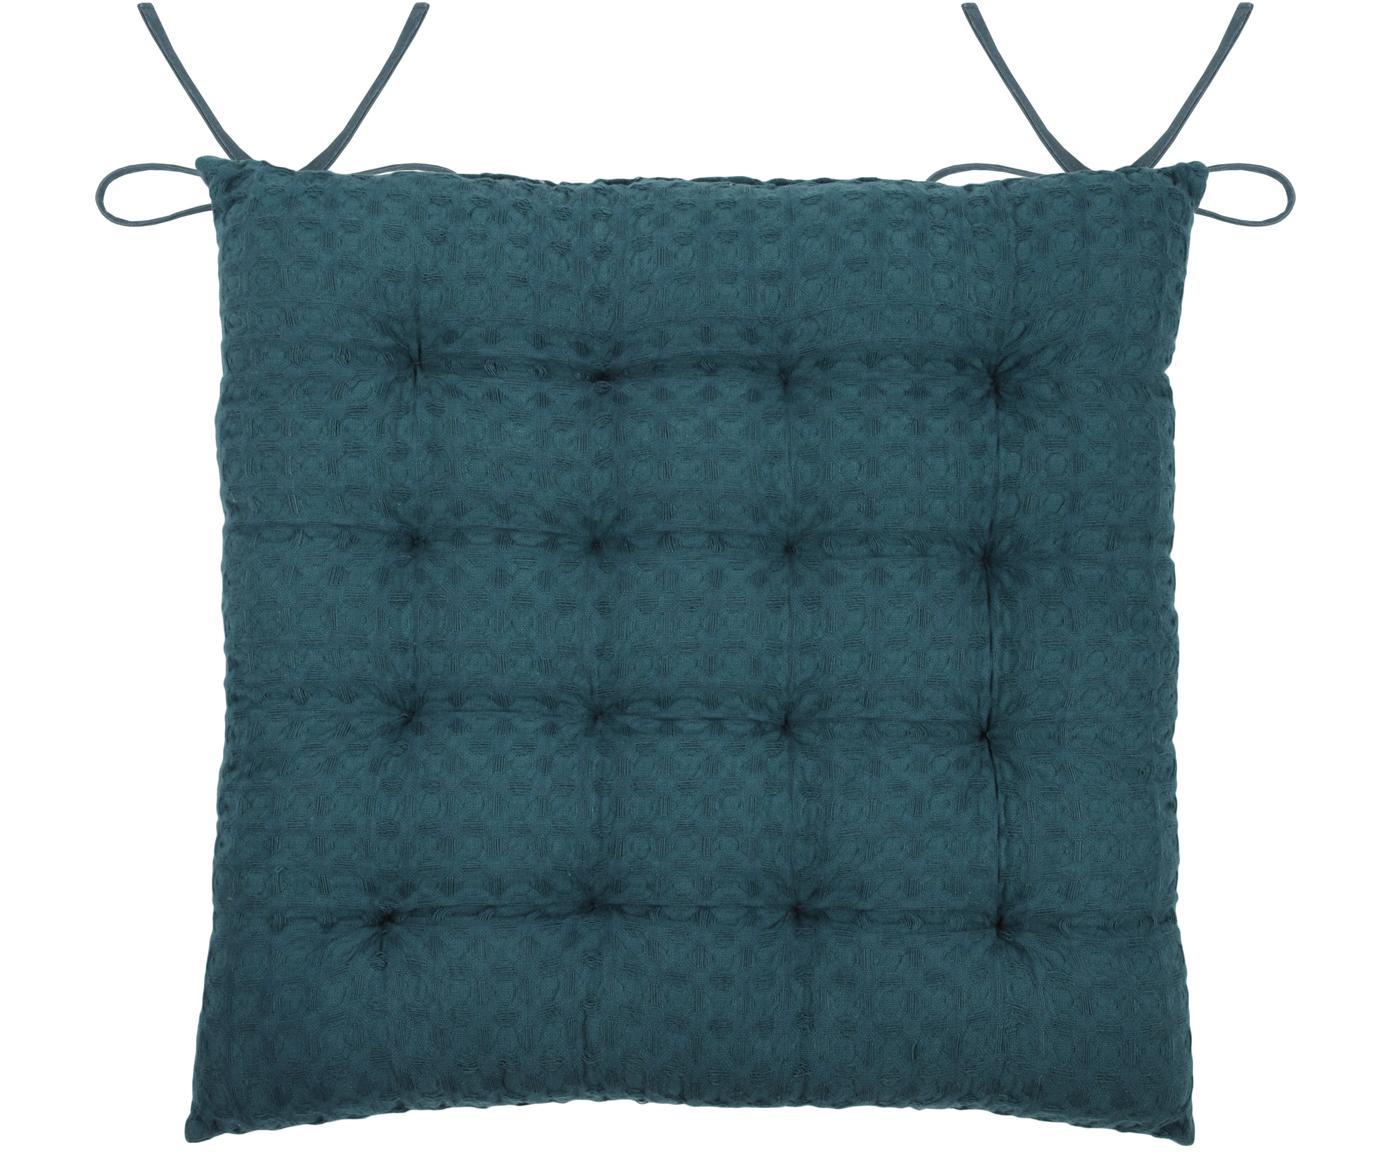 Cojín de asiento Gopher, Azul petróleo, An 40 x L 40 cm